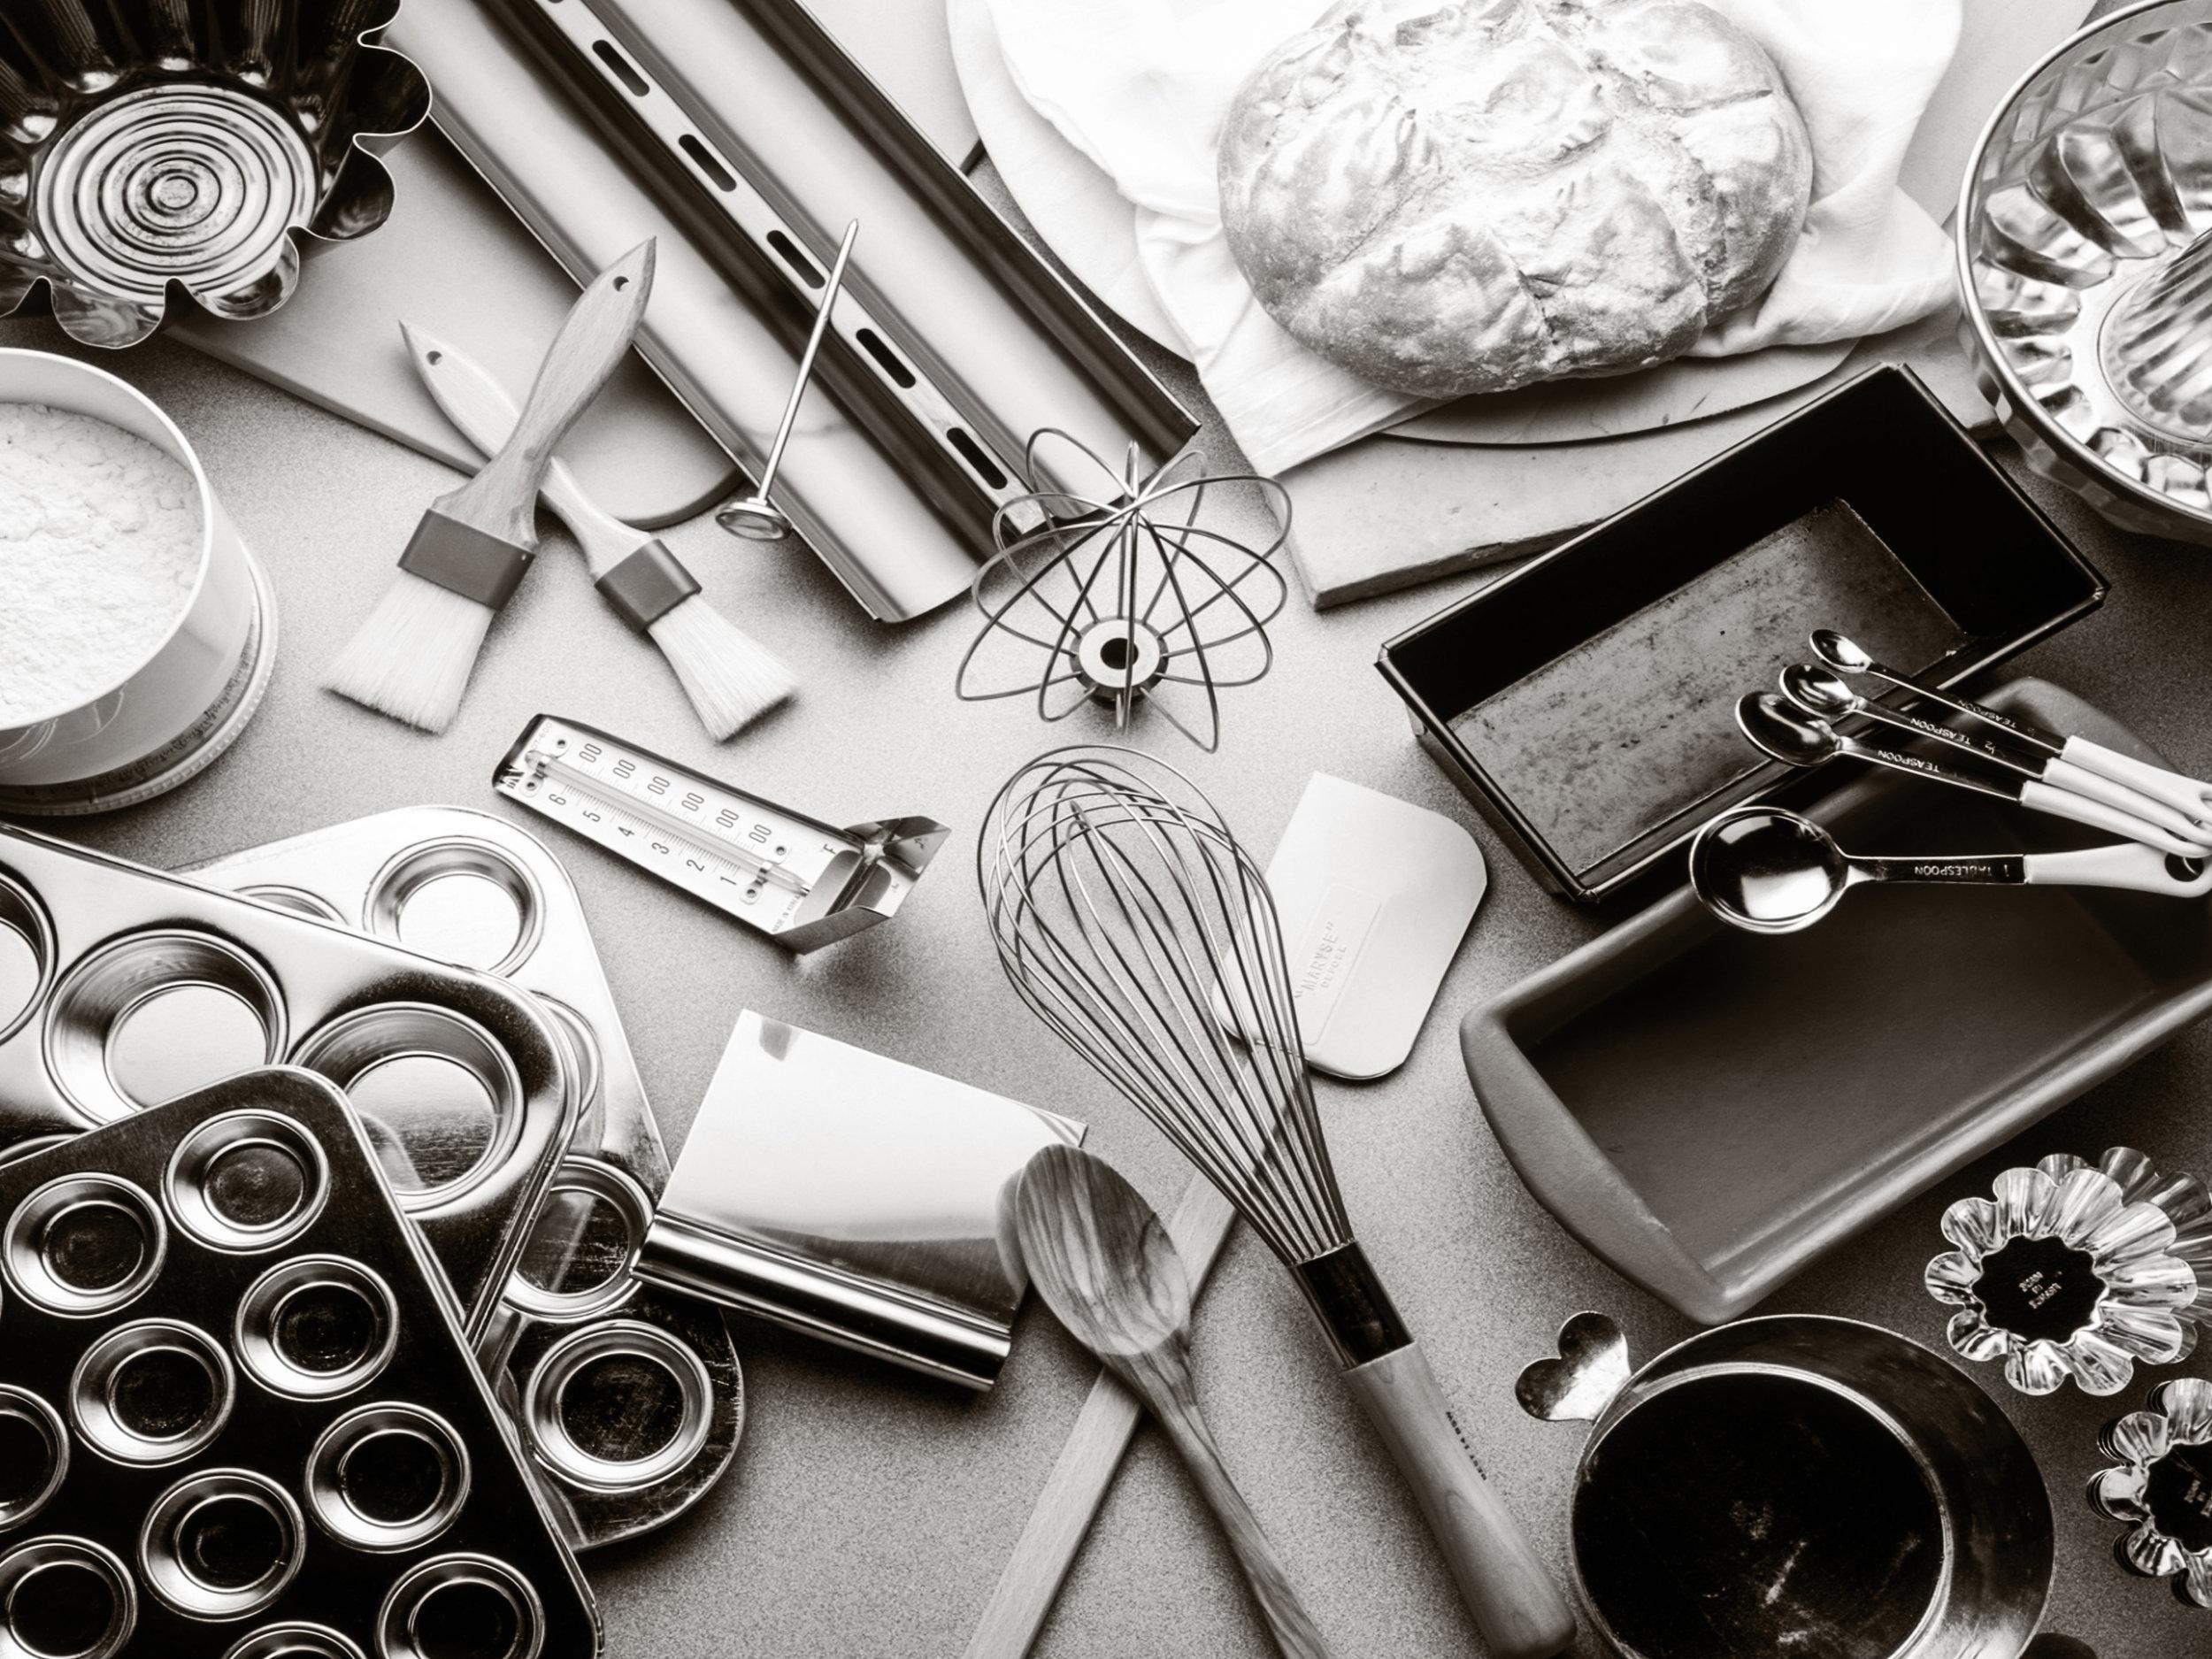 FN_assorted-baking-tools_s4x3.jpg